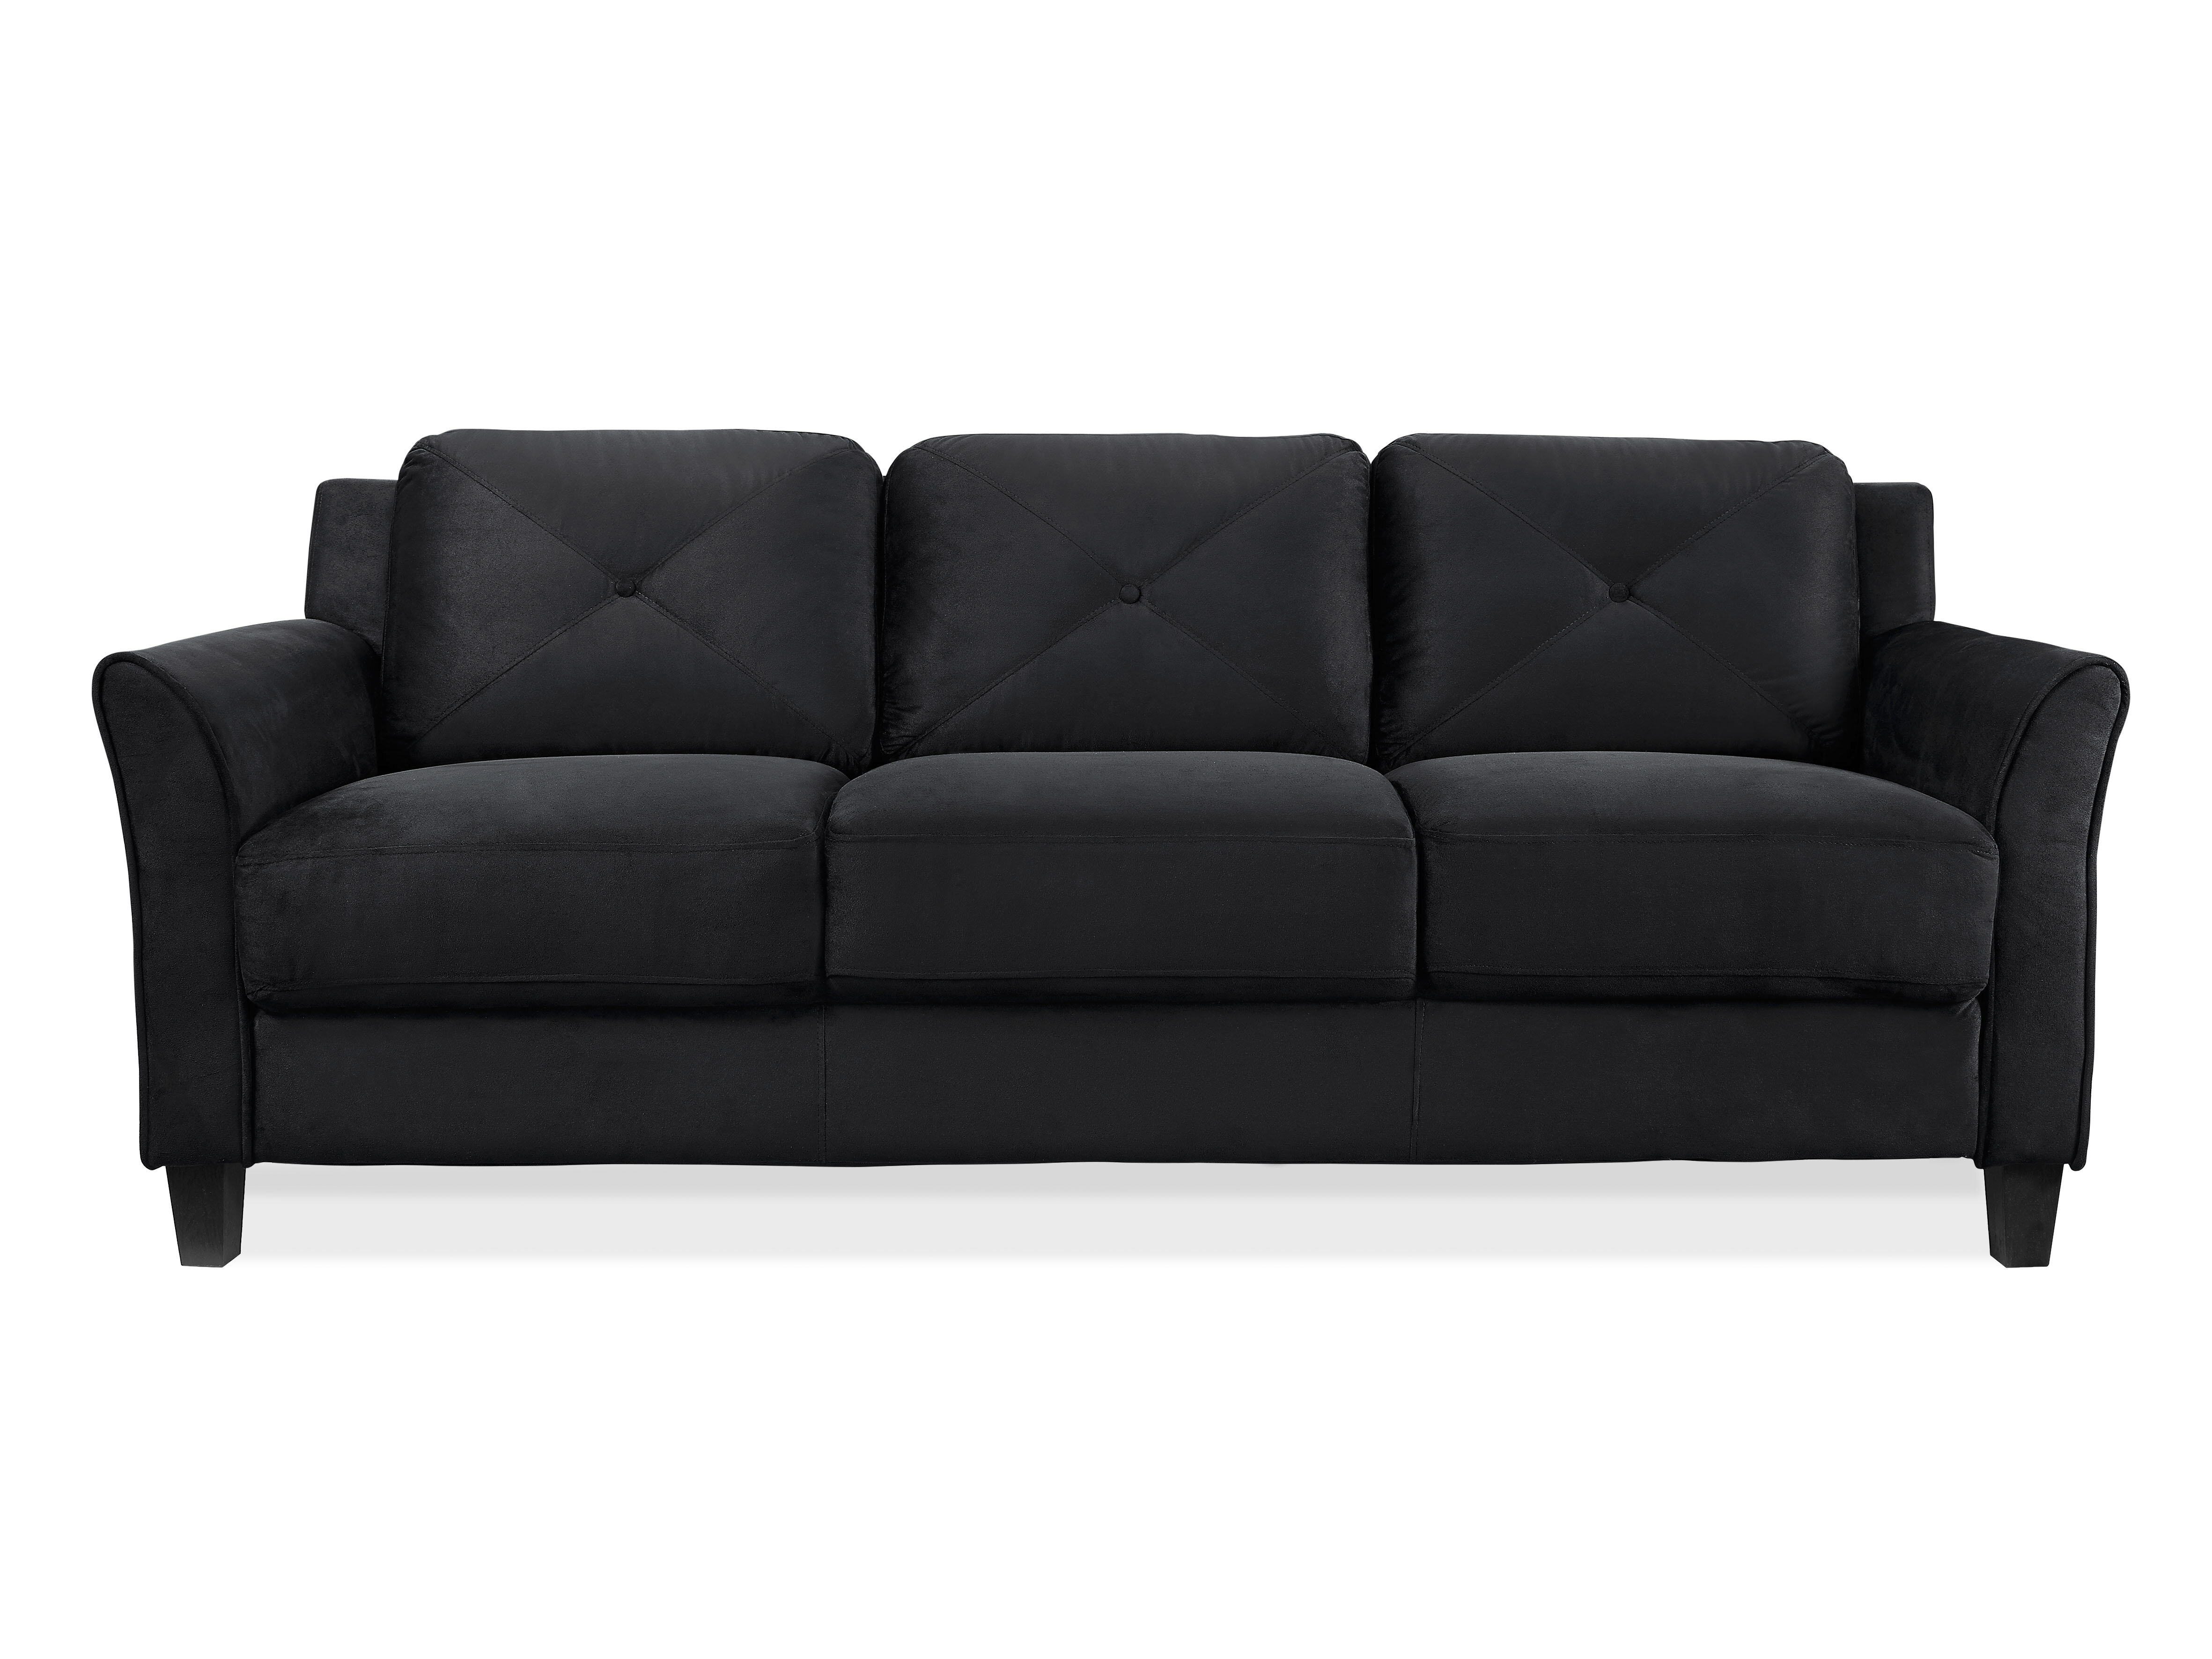 Zipcode Design Ibiza Sofa U0026 Reviews | Wayfair